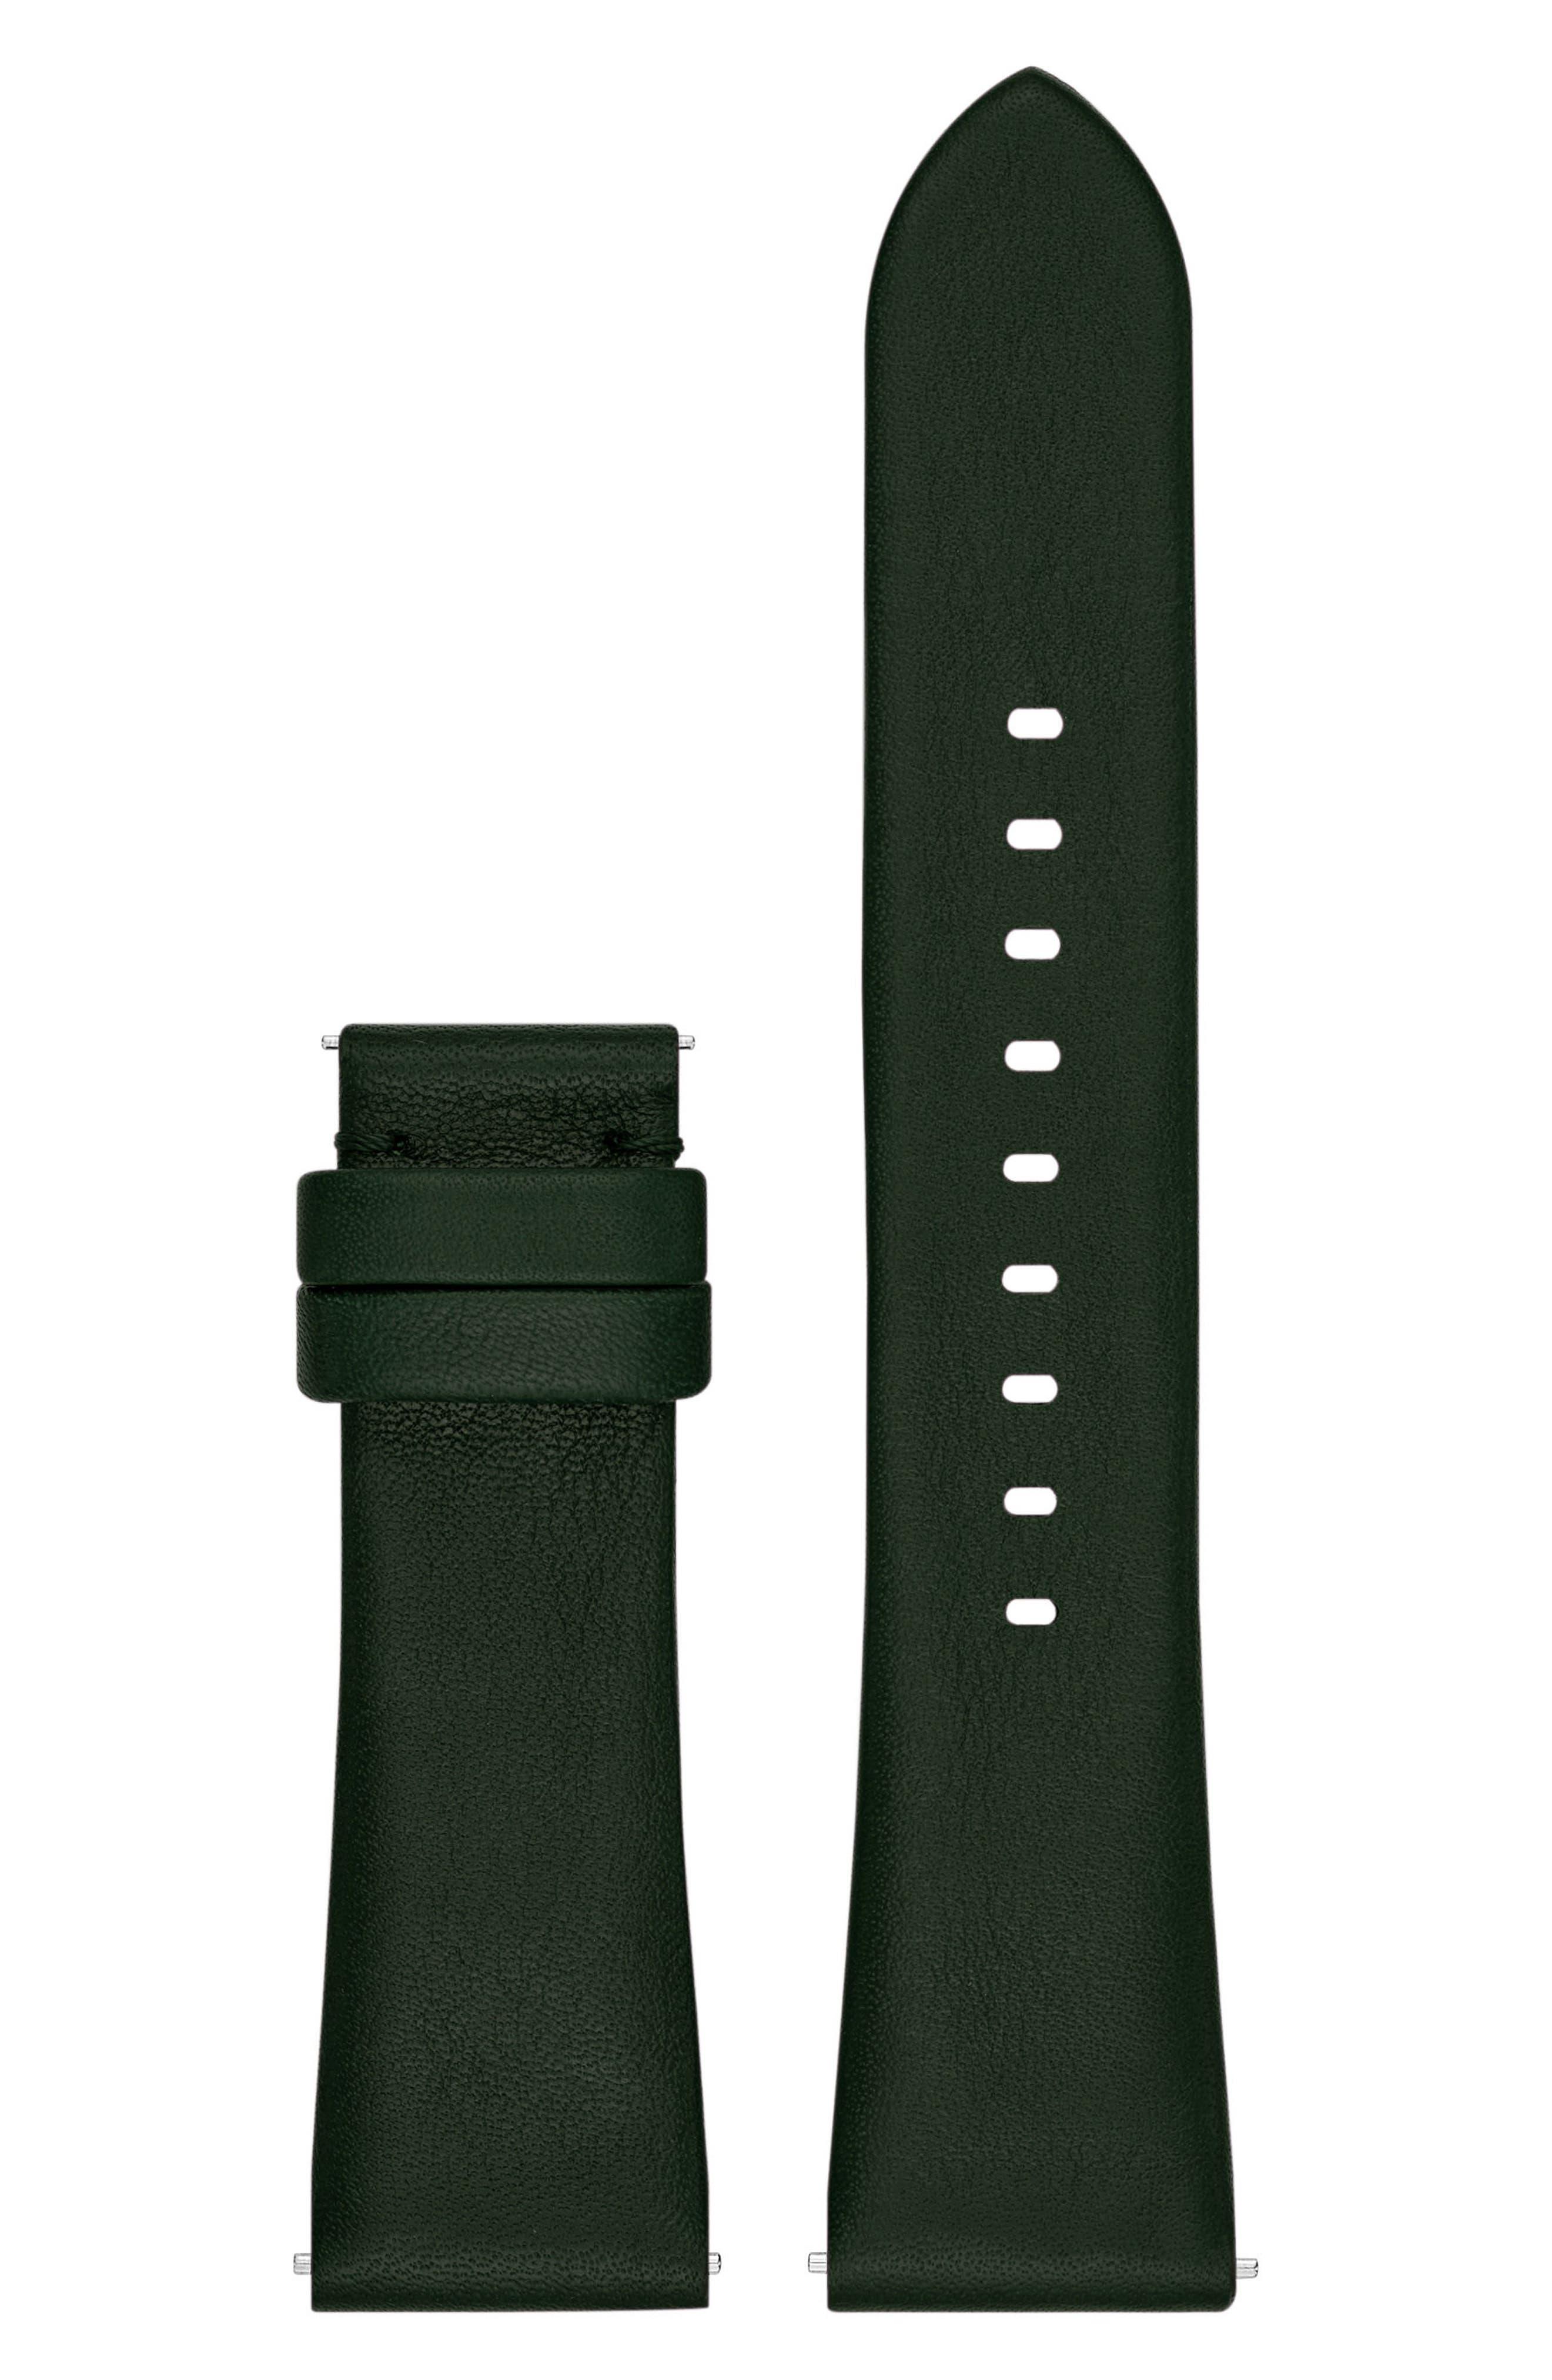 Main Image - Michael Kors Access Bradshaw 22mm Leather Watch Strap